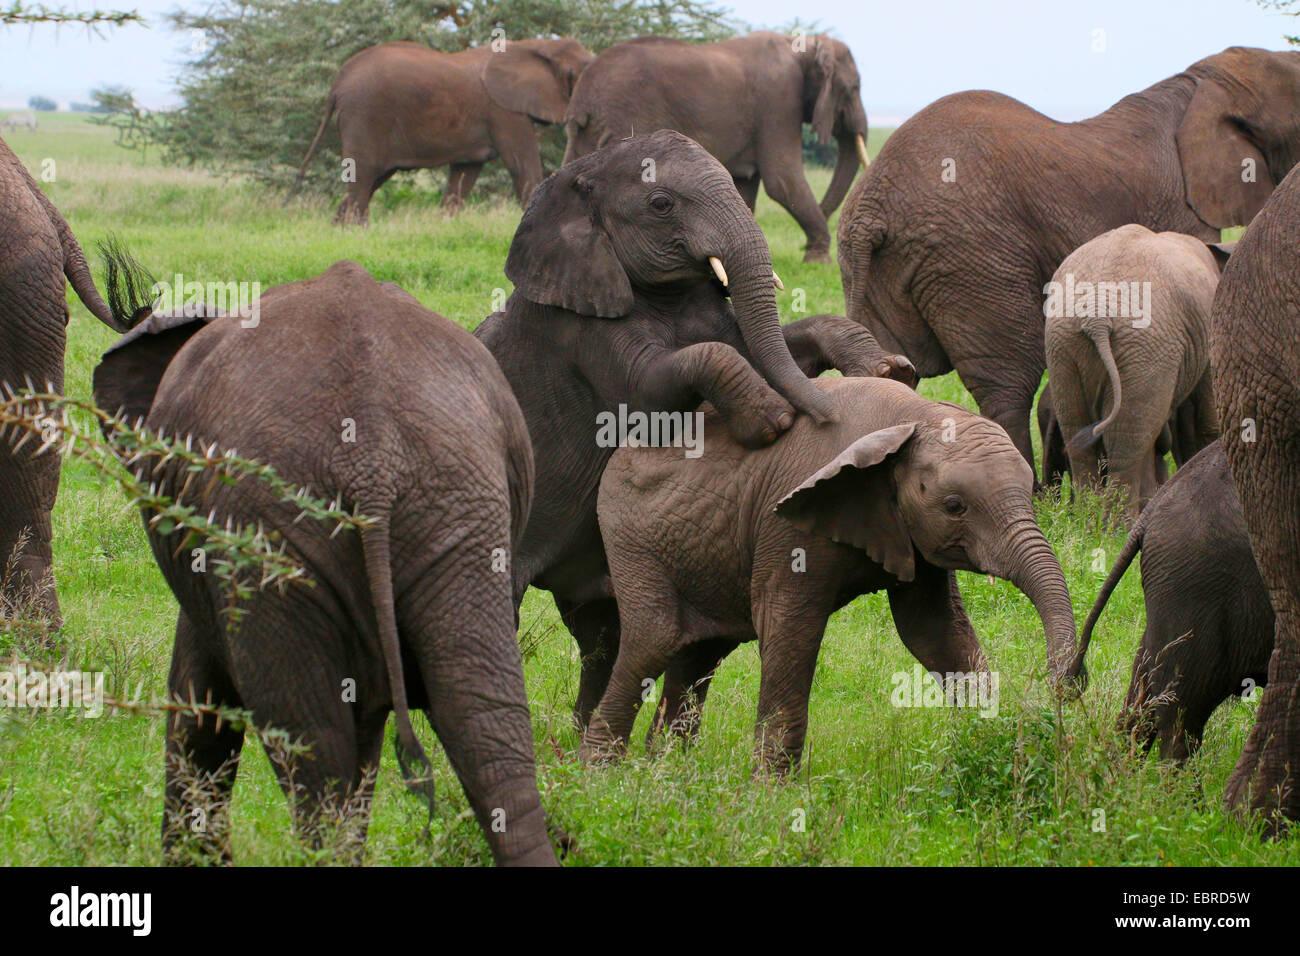 African elephant (Loxodonta africana), romping infants in a herd of elephants, Tanzania, Serengeti National Park - Stock Image